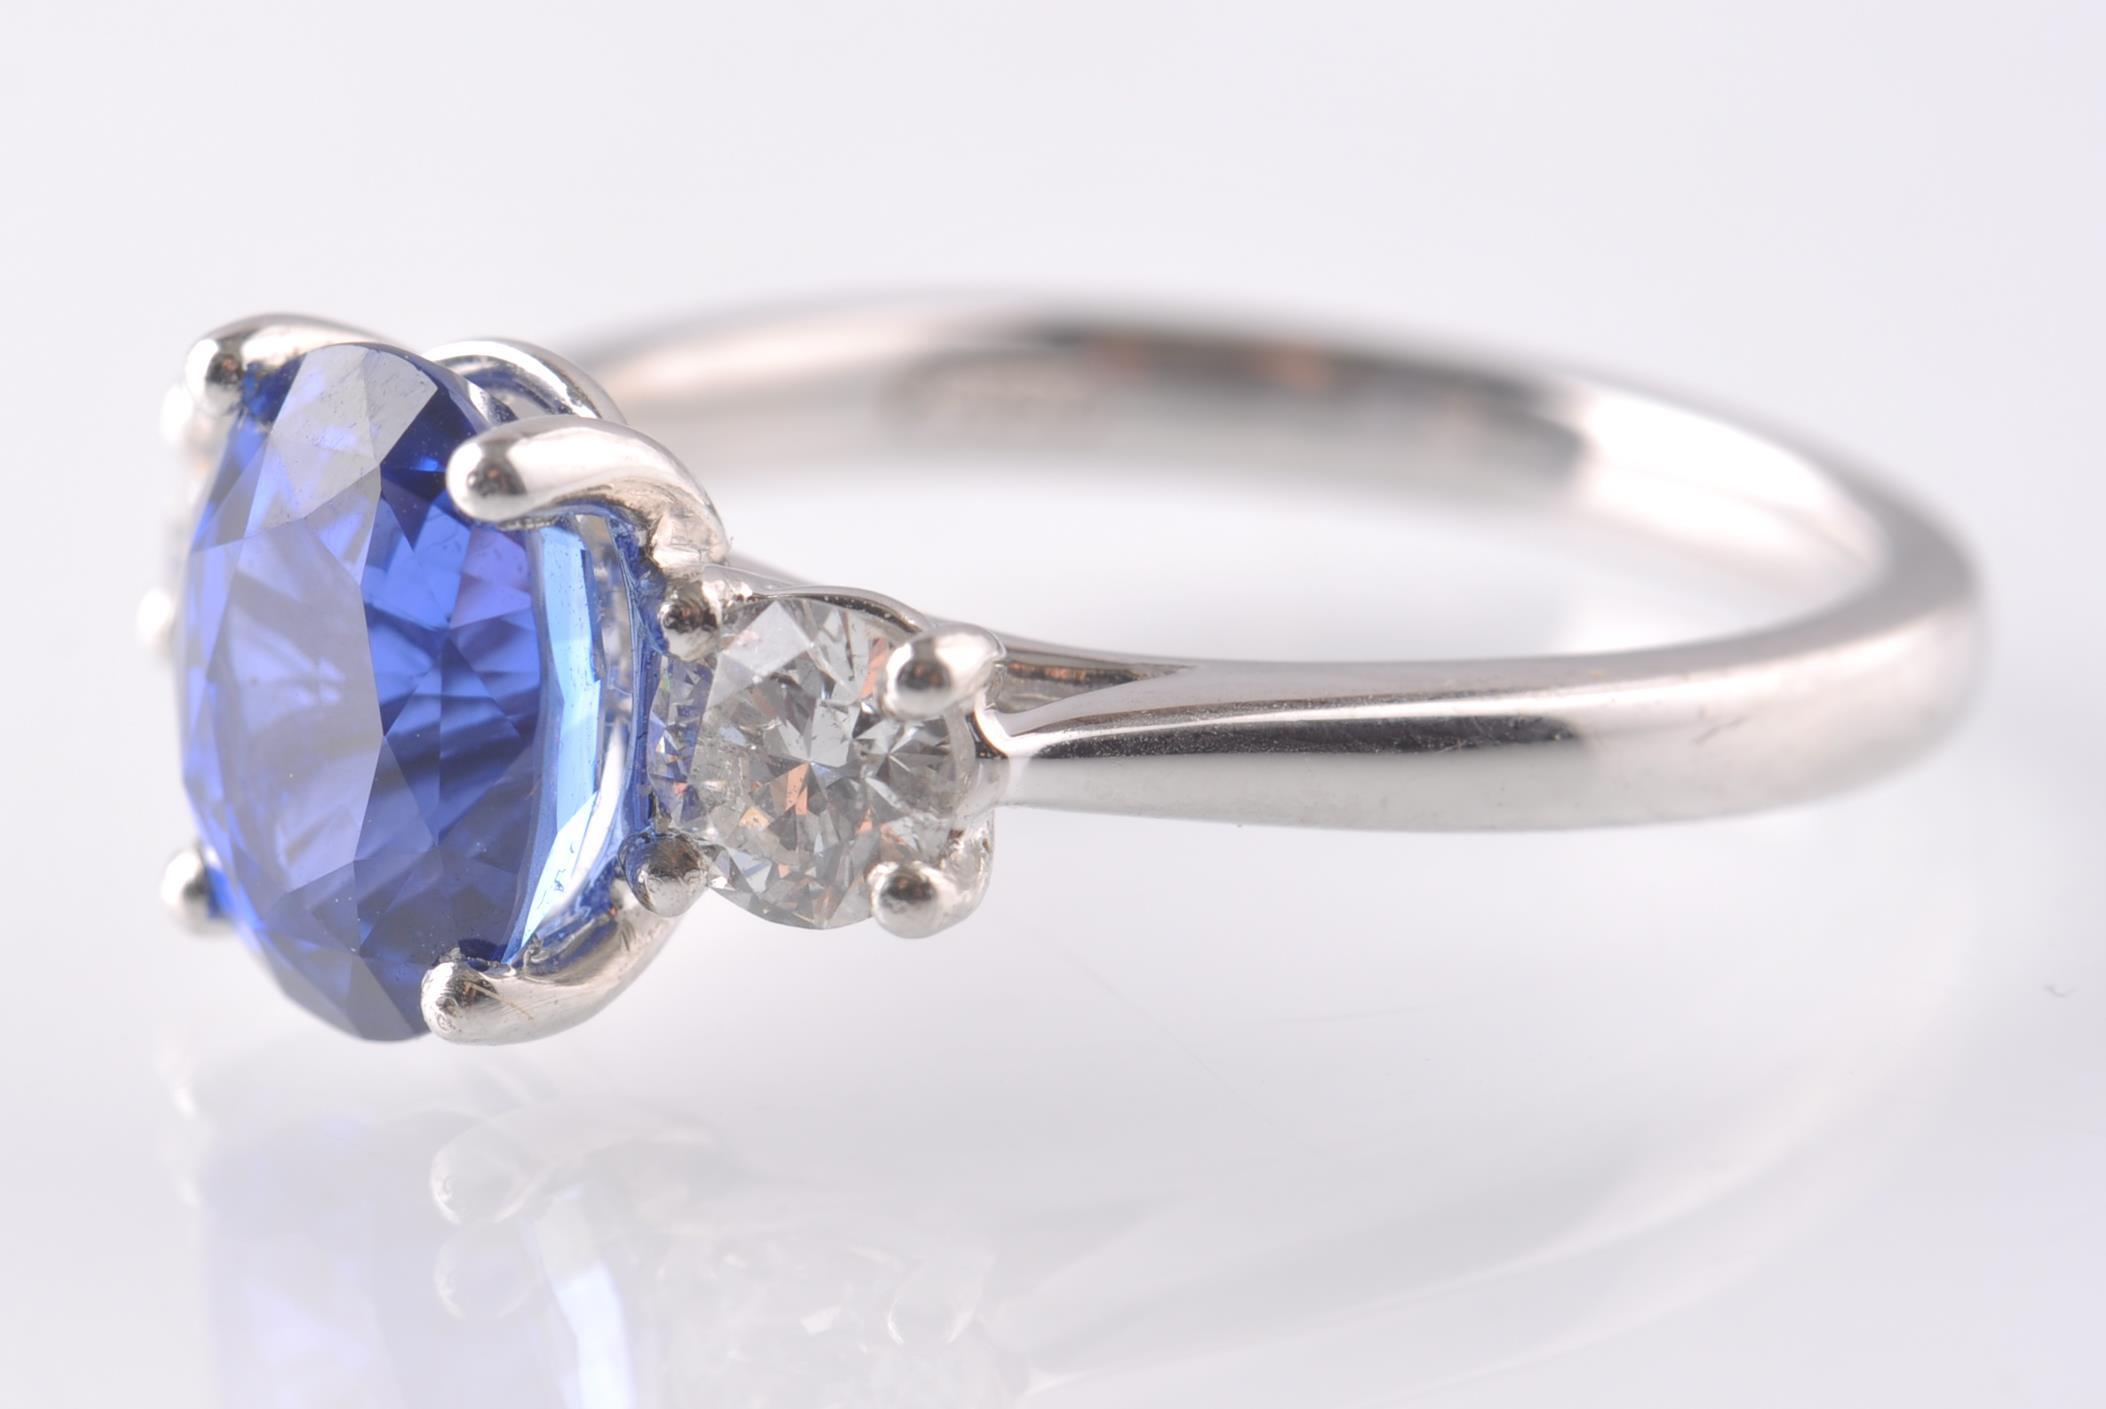 A PLATINUM SAPPHIRE & DIAMOND THREE STONE RING. - Image 2 of 5